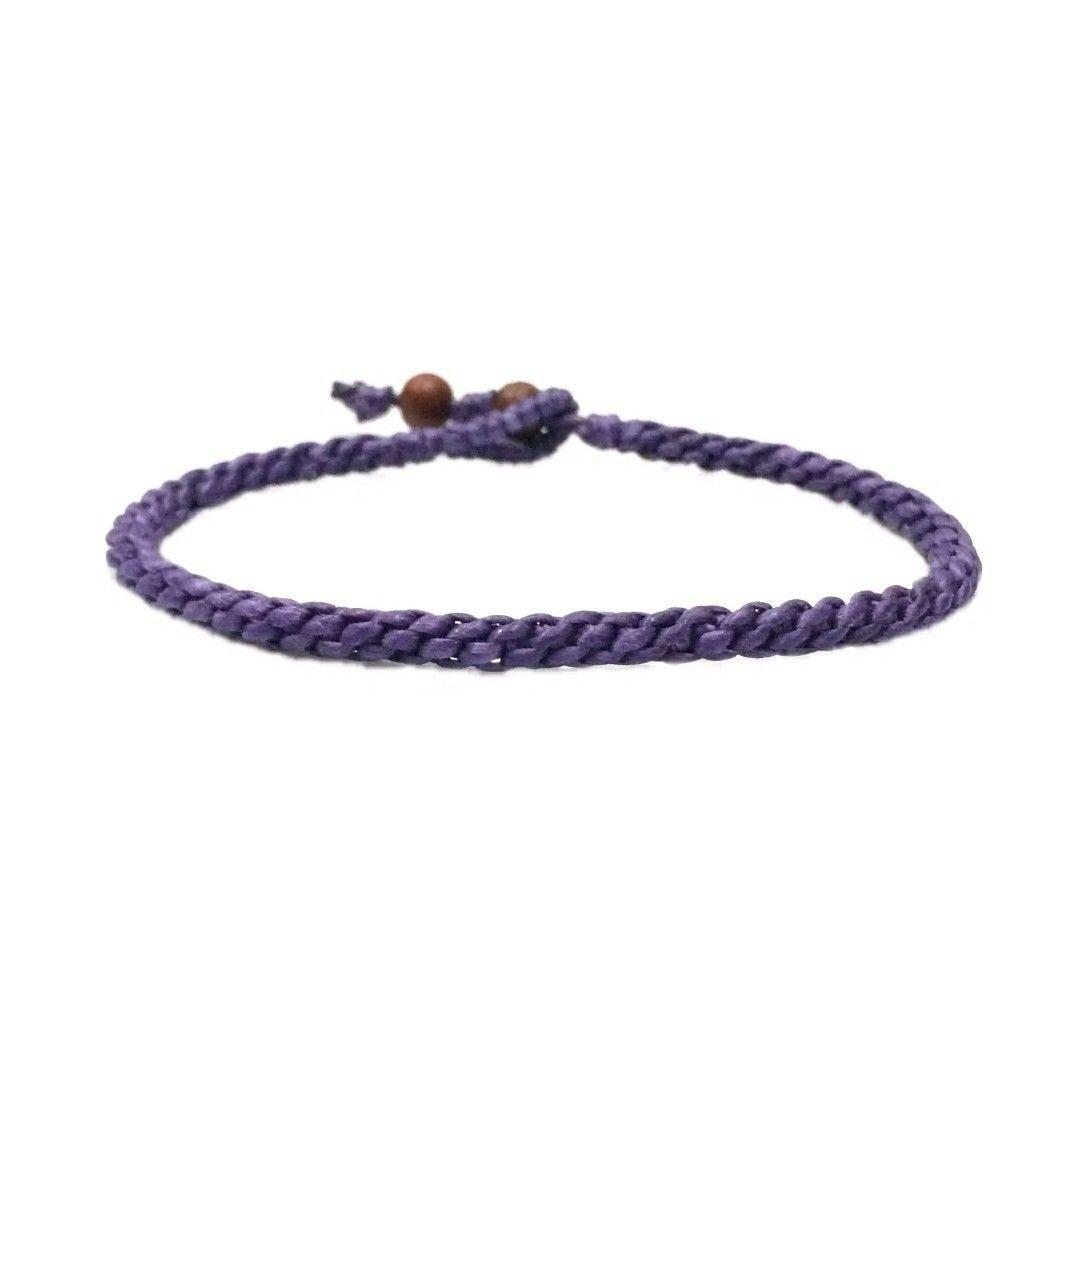 Handmade FAIR TRADE Skinny Waxed COTTON Classic Thai WRISTBAND Bracelet